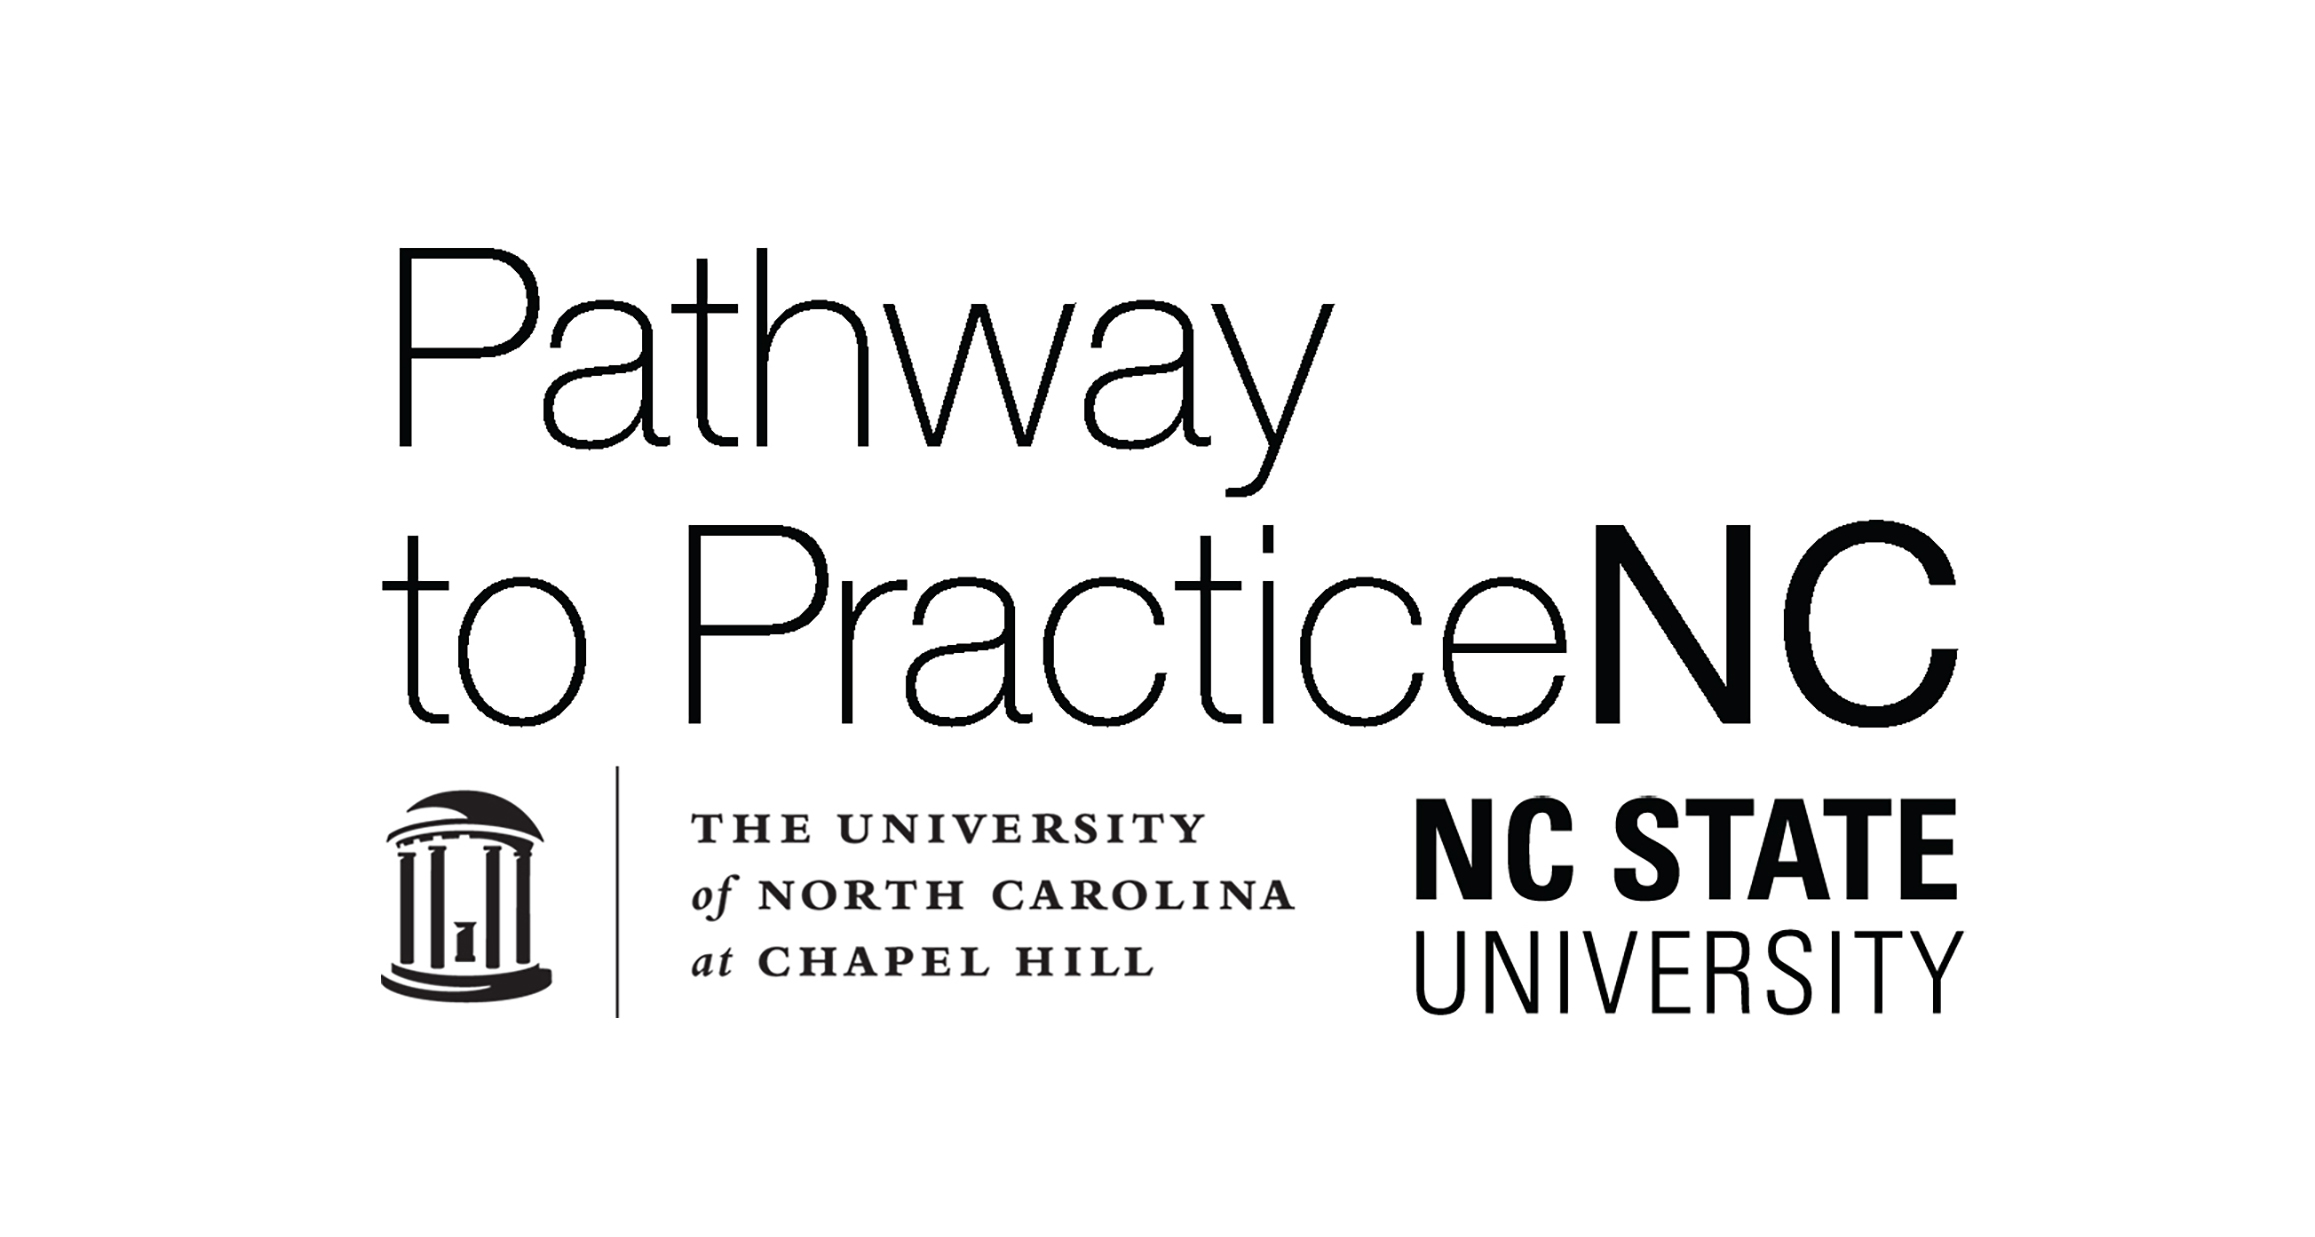 Pathway to Practice NC logo